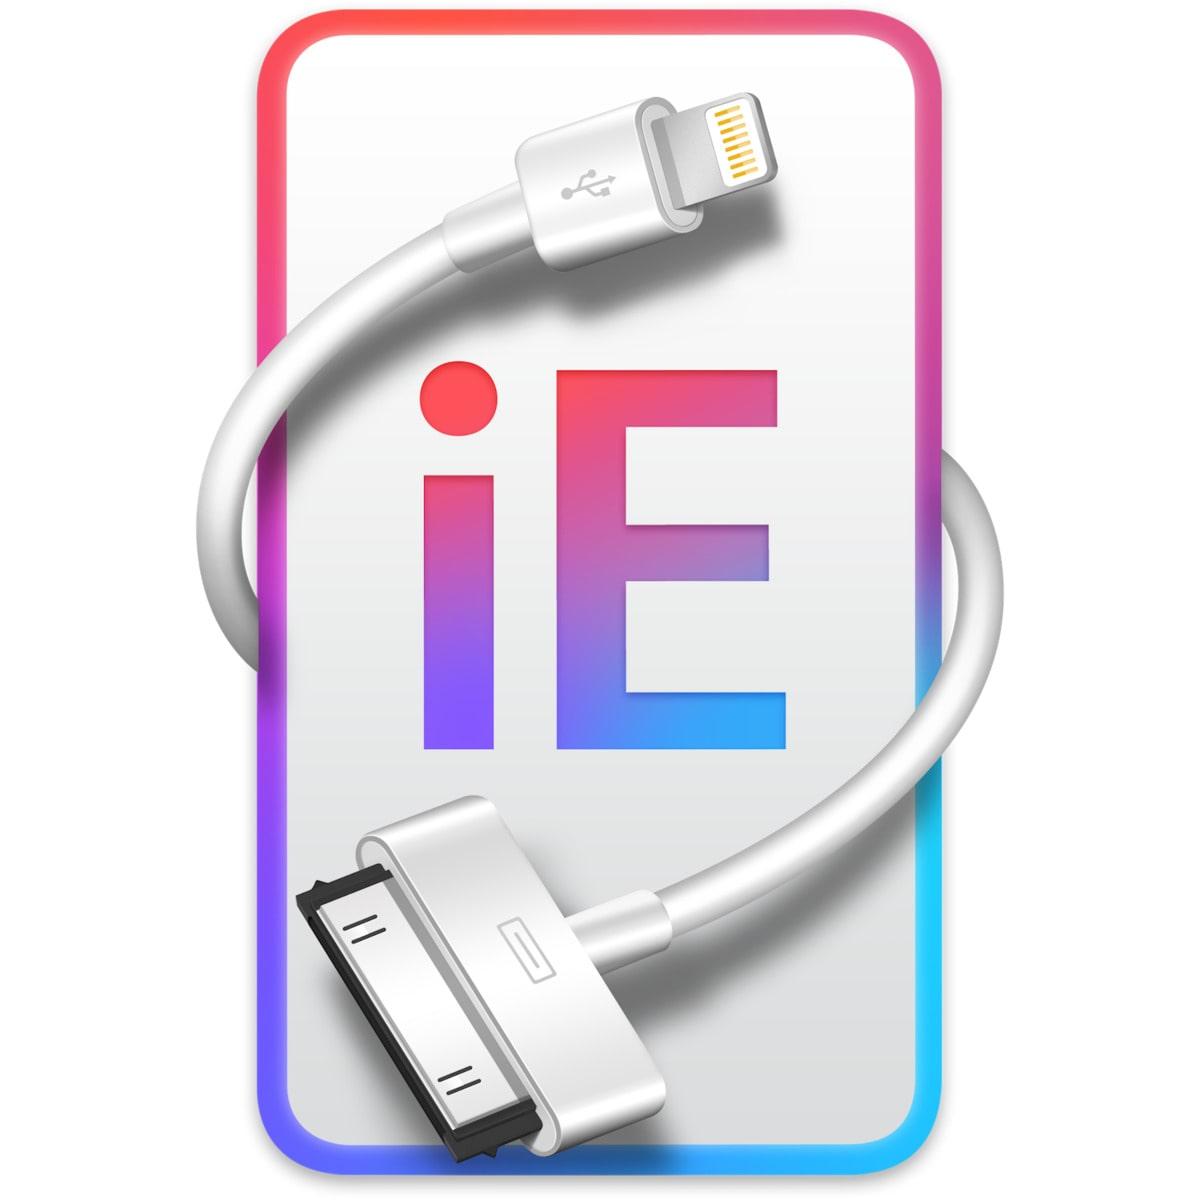 iExplorer4-icon-open_graph